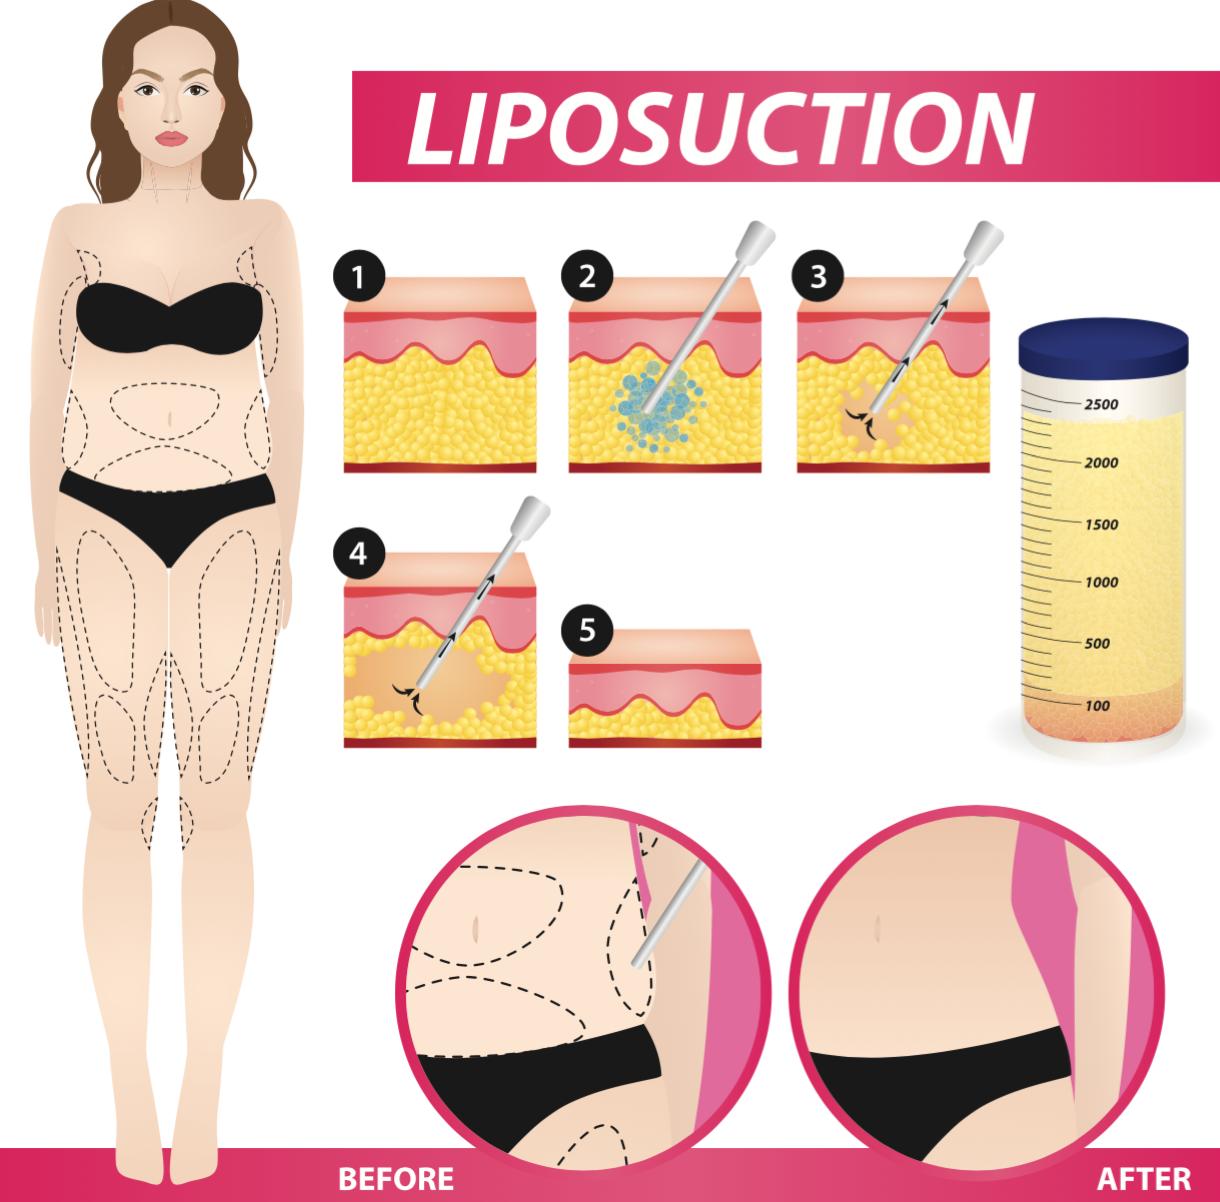 liposuction procedure in Singapore